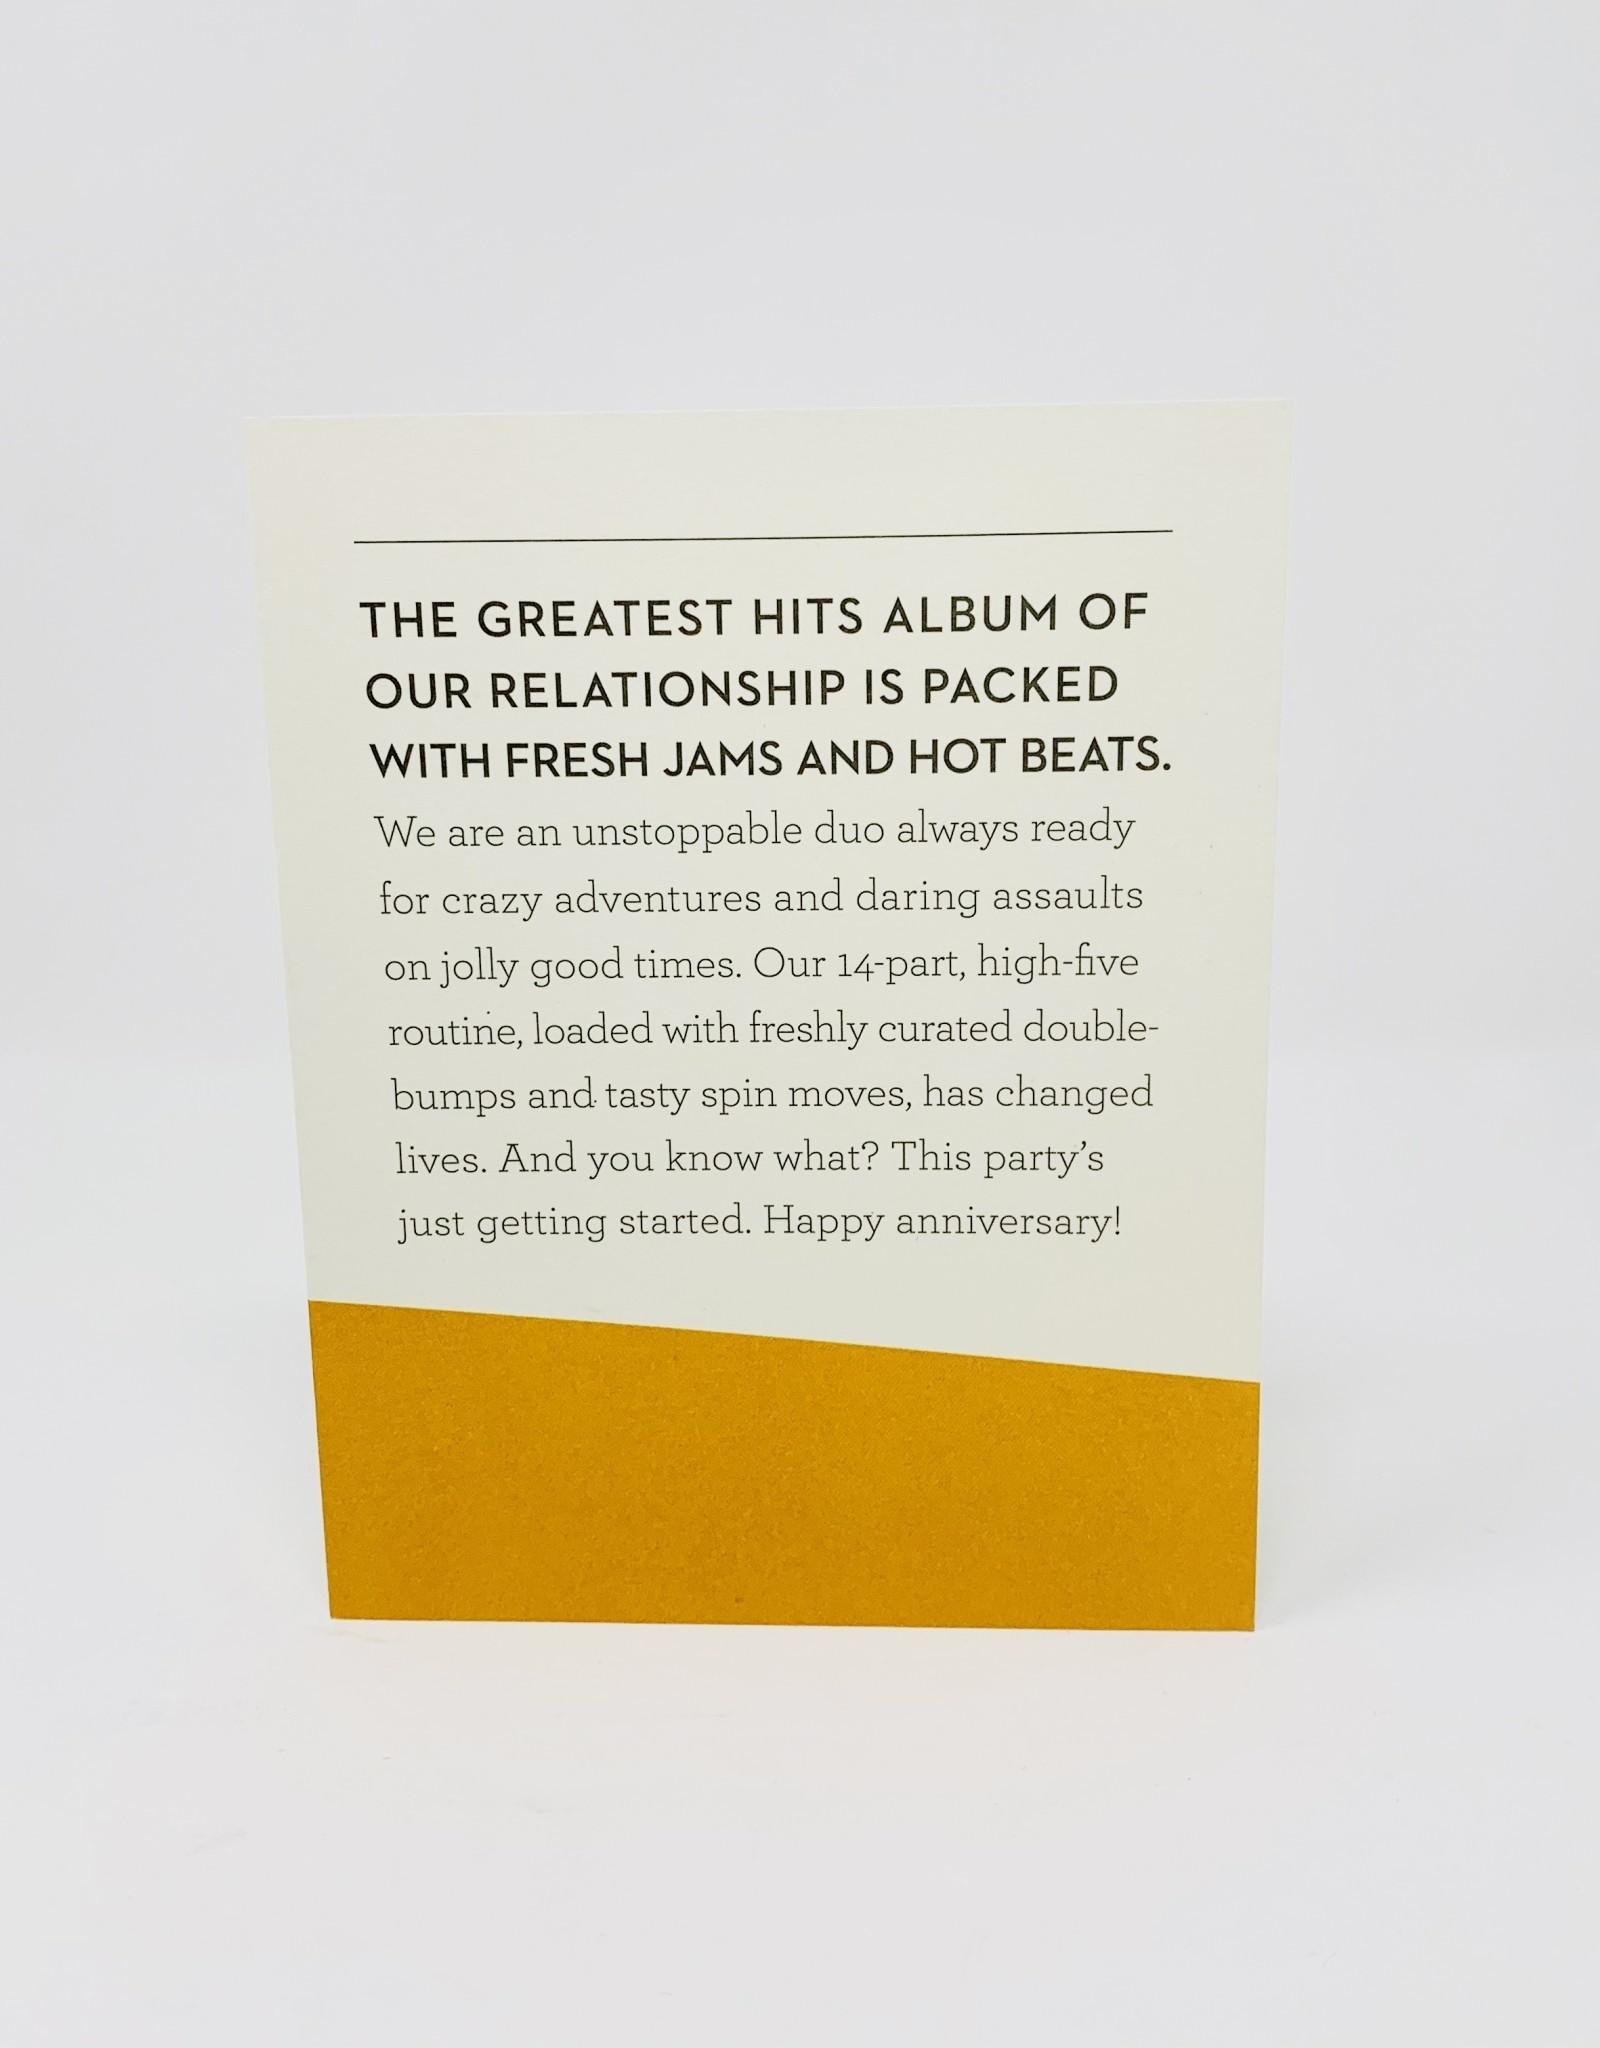 Compendium Fresh jams & Hot Beats